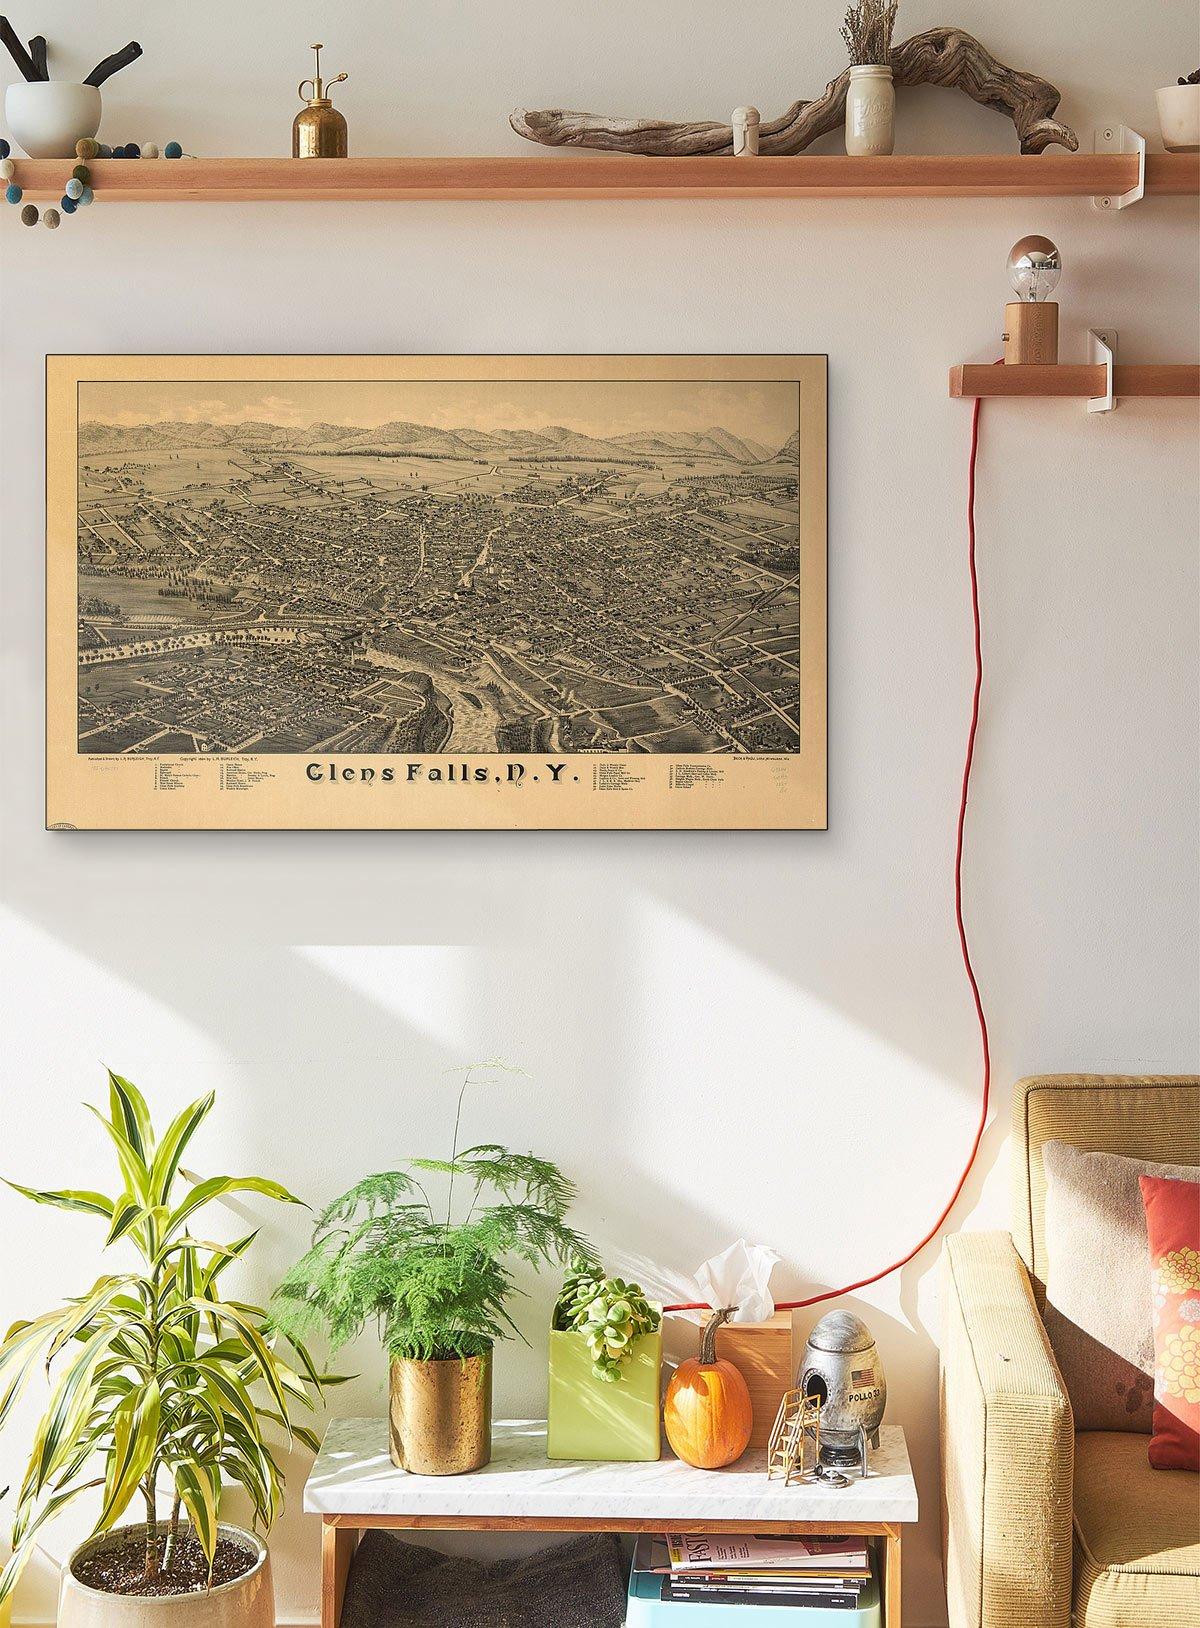 Glens Falls N.y LARGE Vintage Map